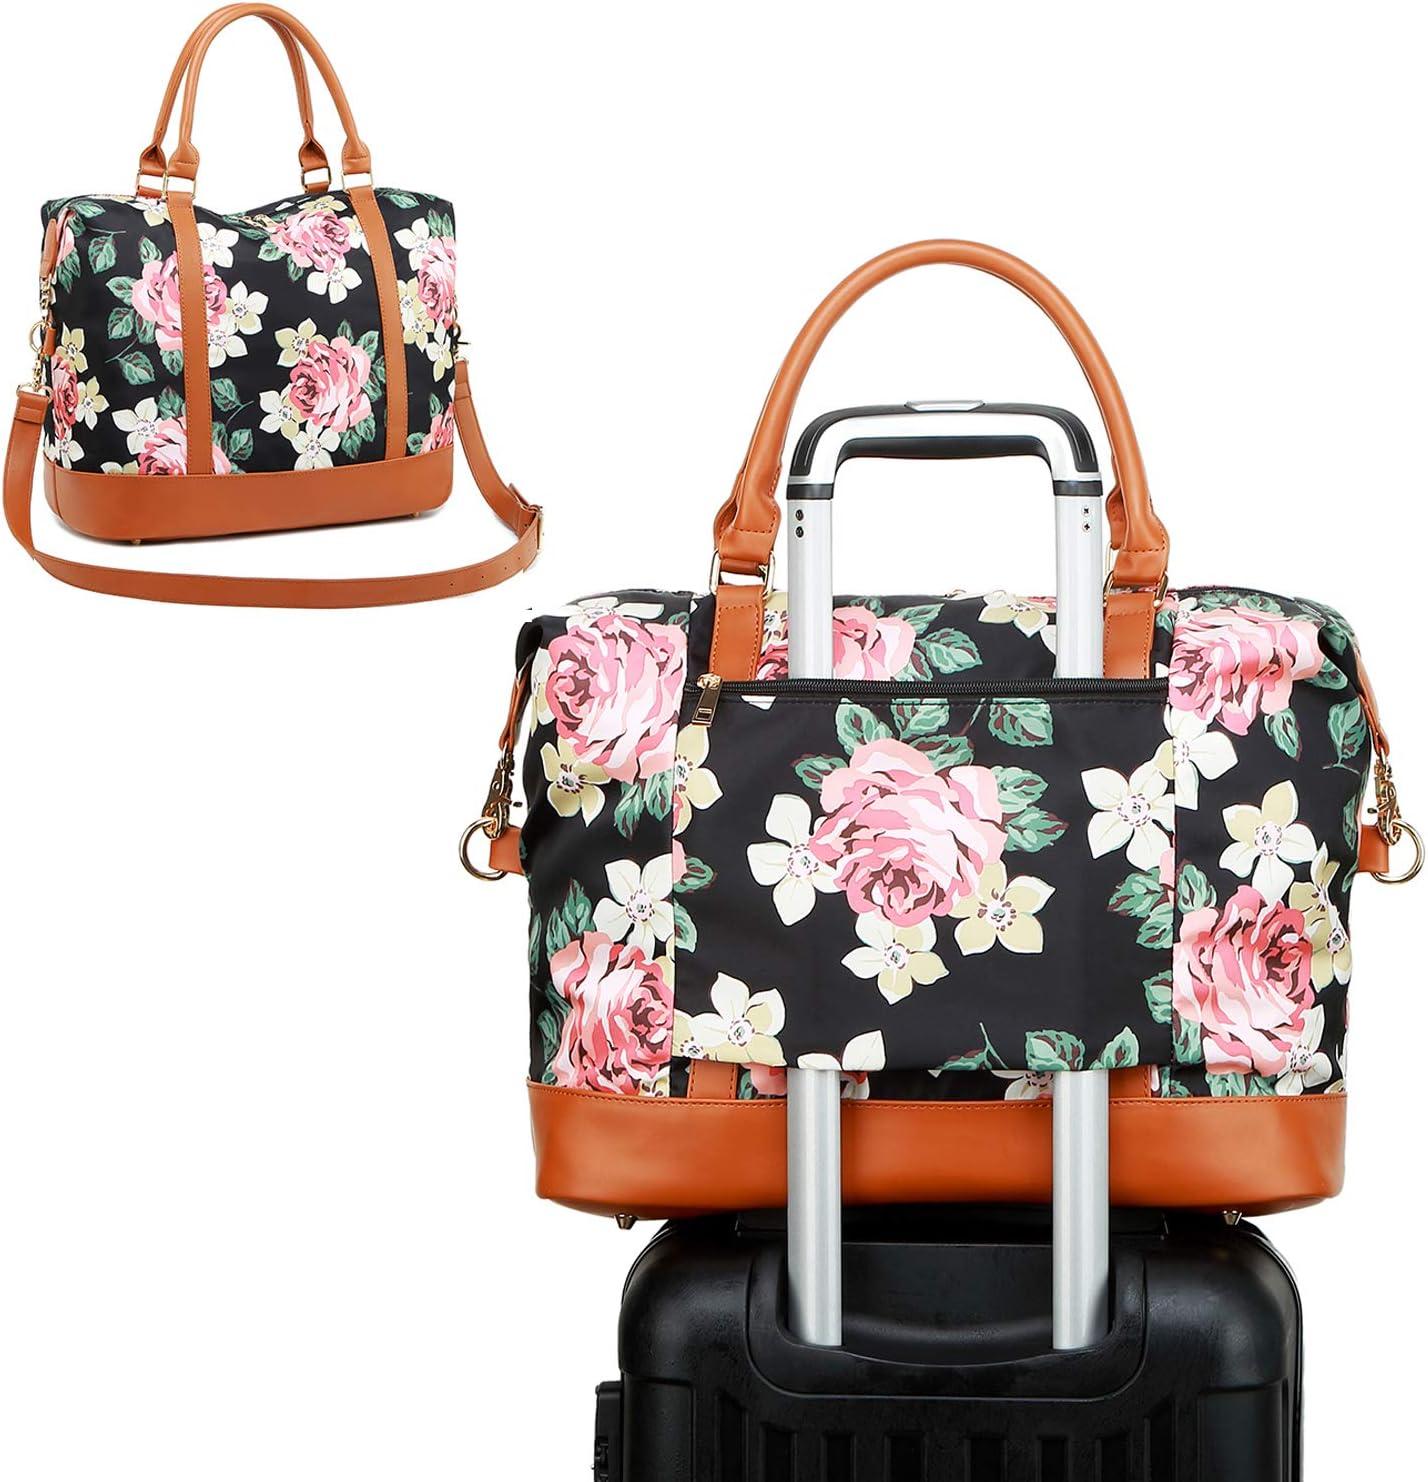 Travel Luggage Duffle Bag Lightweight Portable Handbag Sea Wave Large Capacity Waterproof Foldable Storage Tote